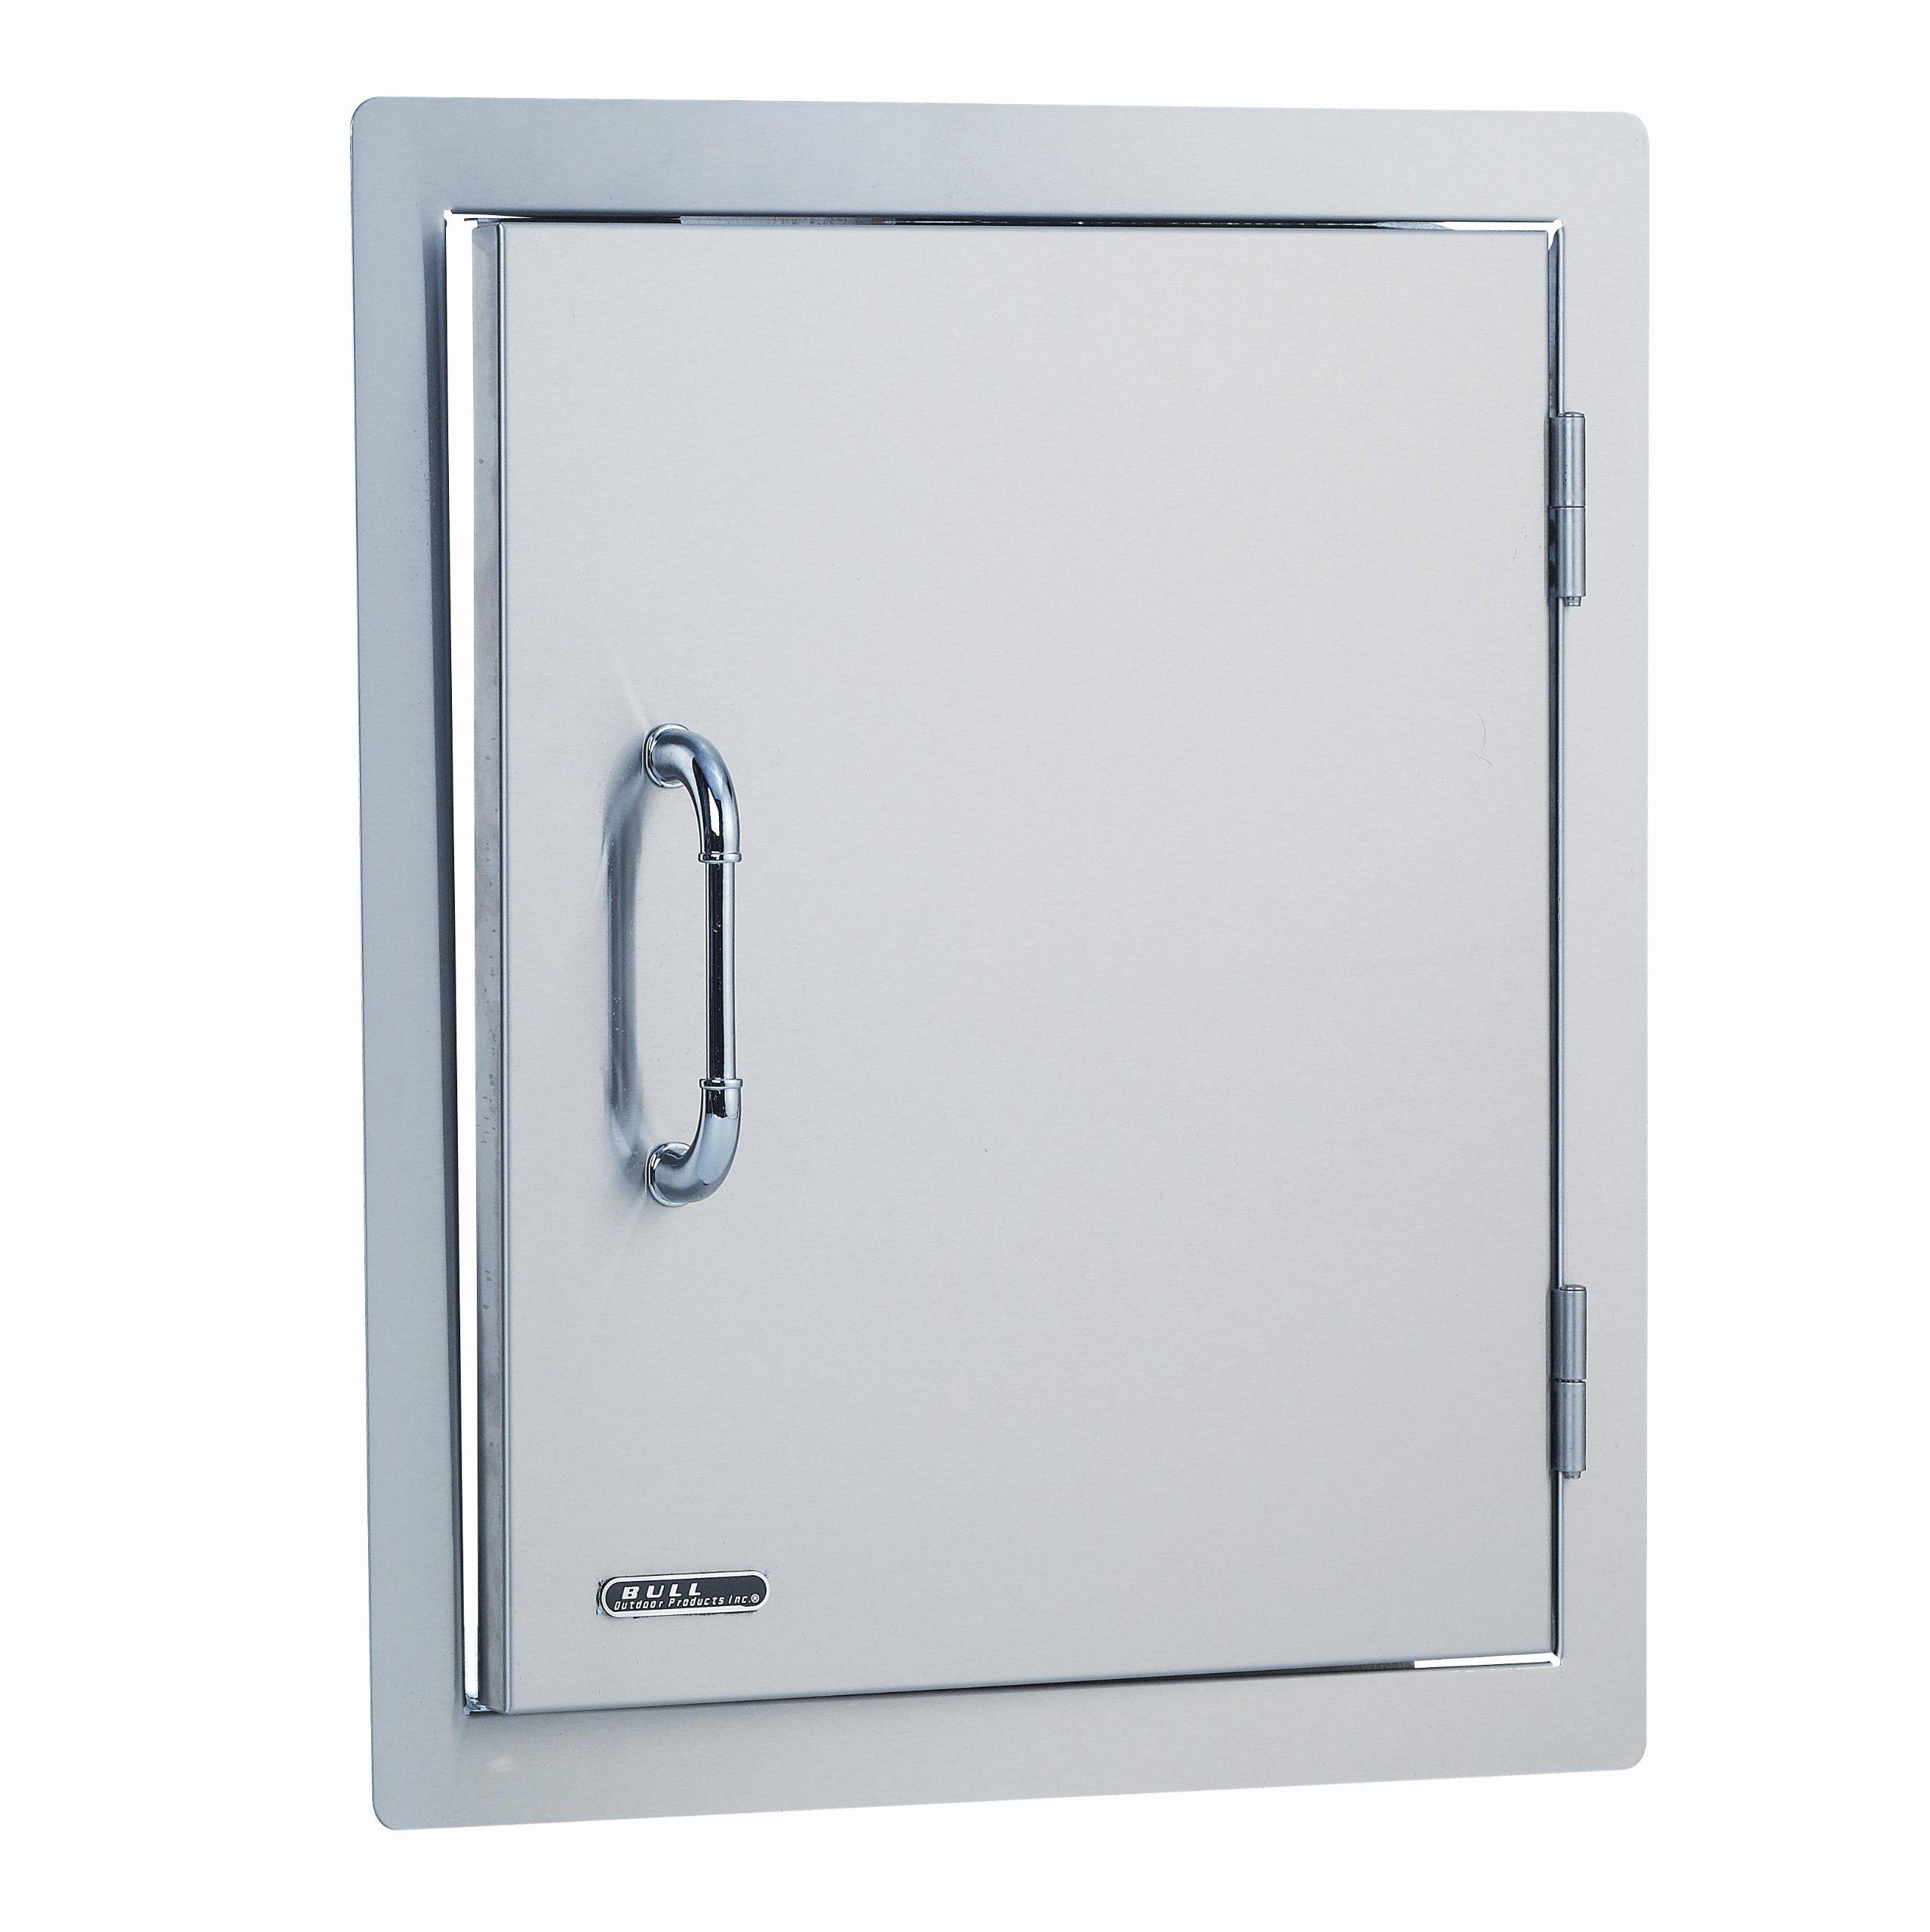 Bull Outdoor Products 89975 Stainless Steel Single Vertical Door